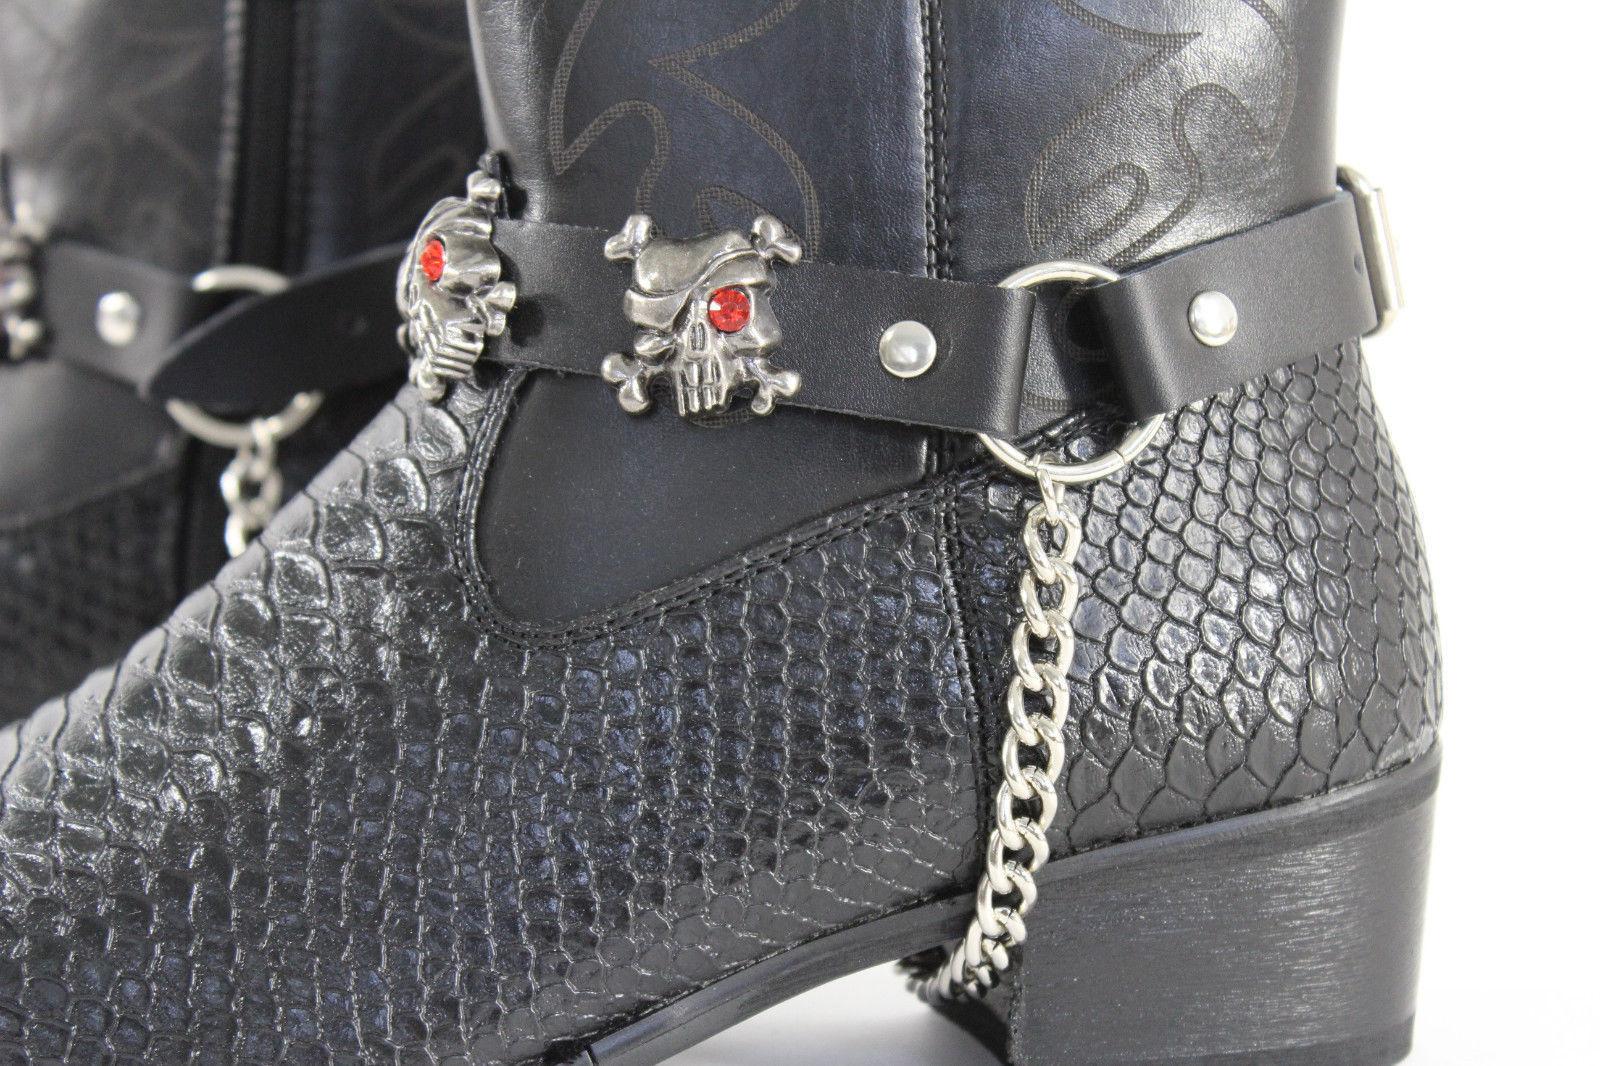 New Men Biker Boots Bracelets Chain Black Leather 2 Straps Skull Skeleton Pirate